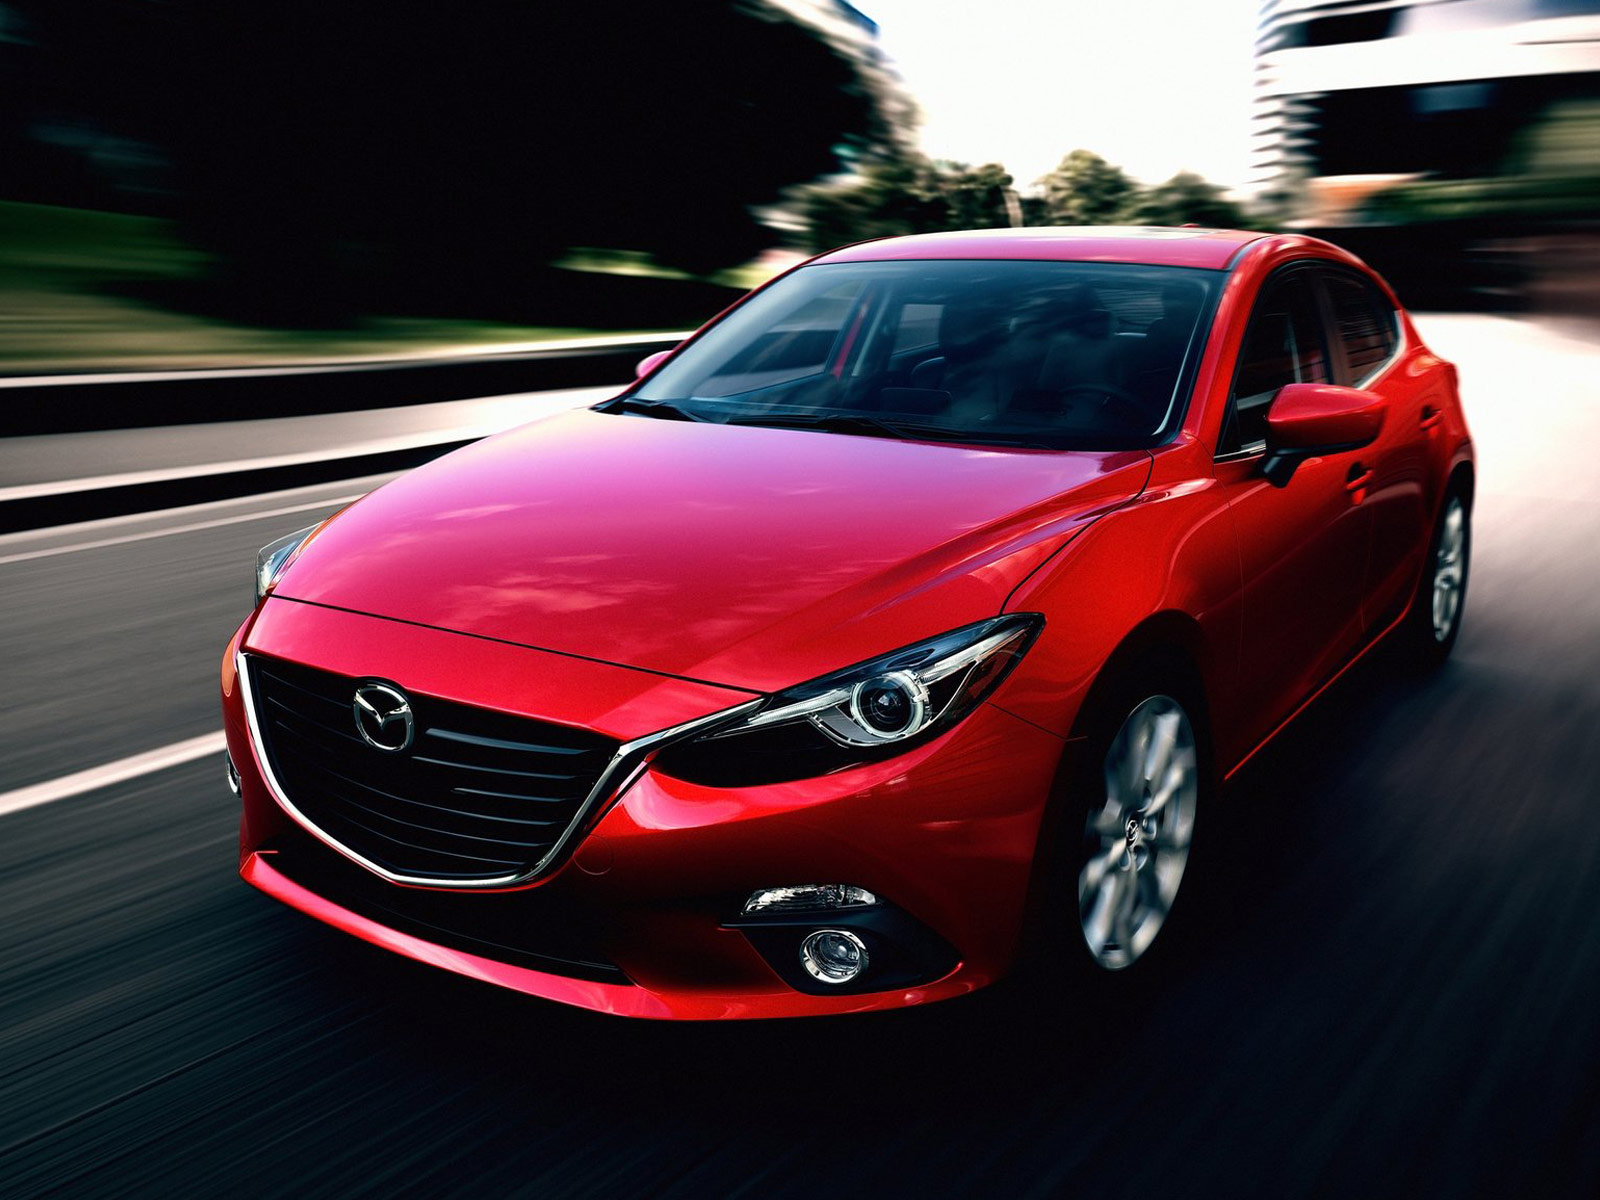 2014 Mazda 3 Car Insurance Information, Photos